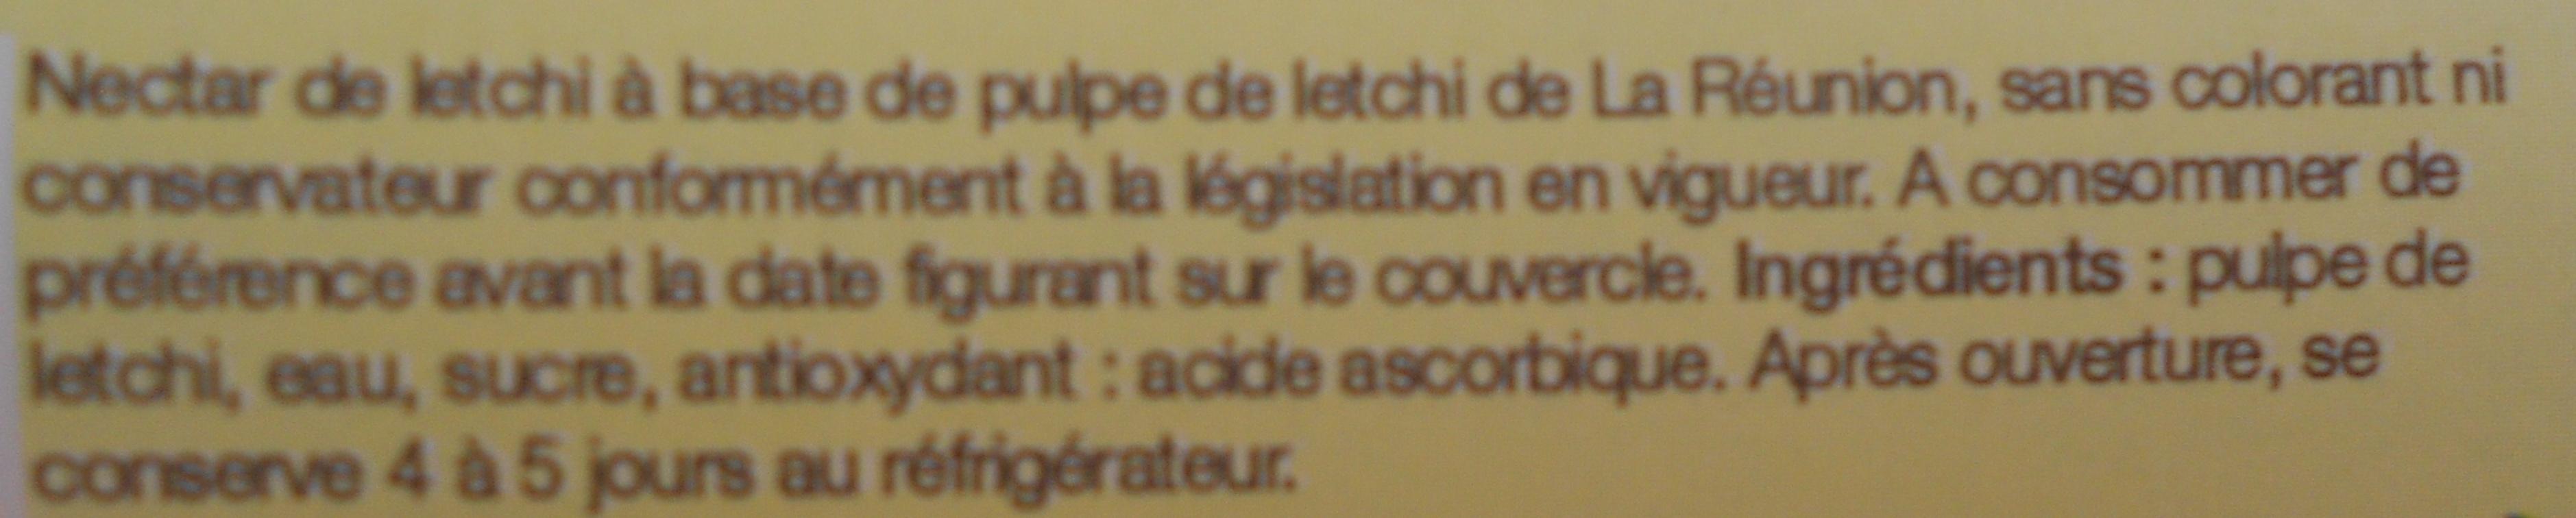 Nectar de letchis - Ingredienti - fr